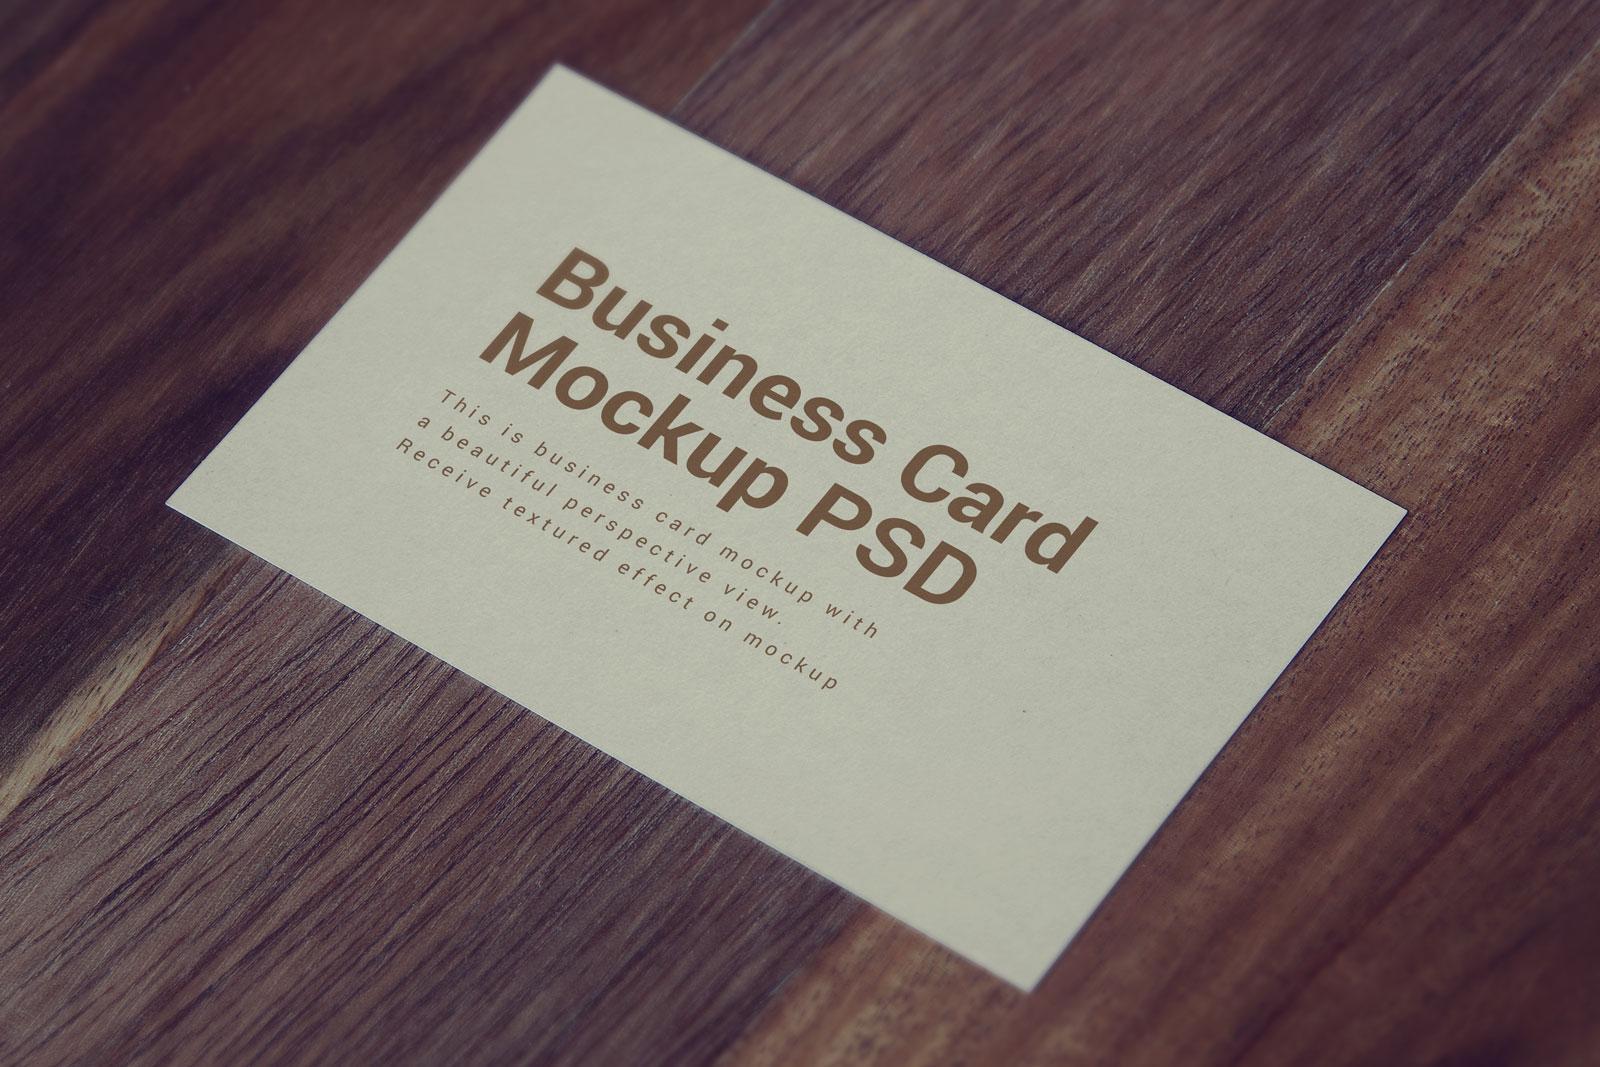 blank business card design mockup psd file free download - HD1600×1067